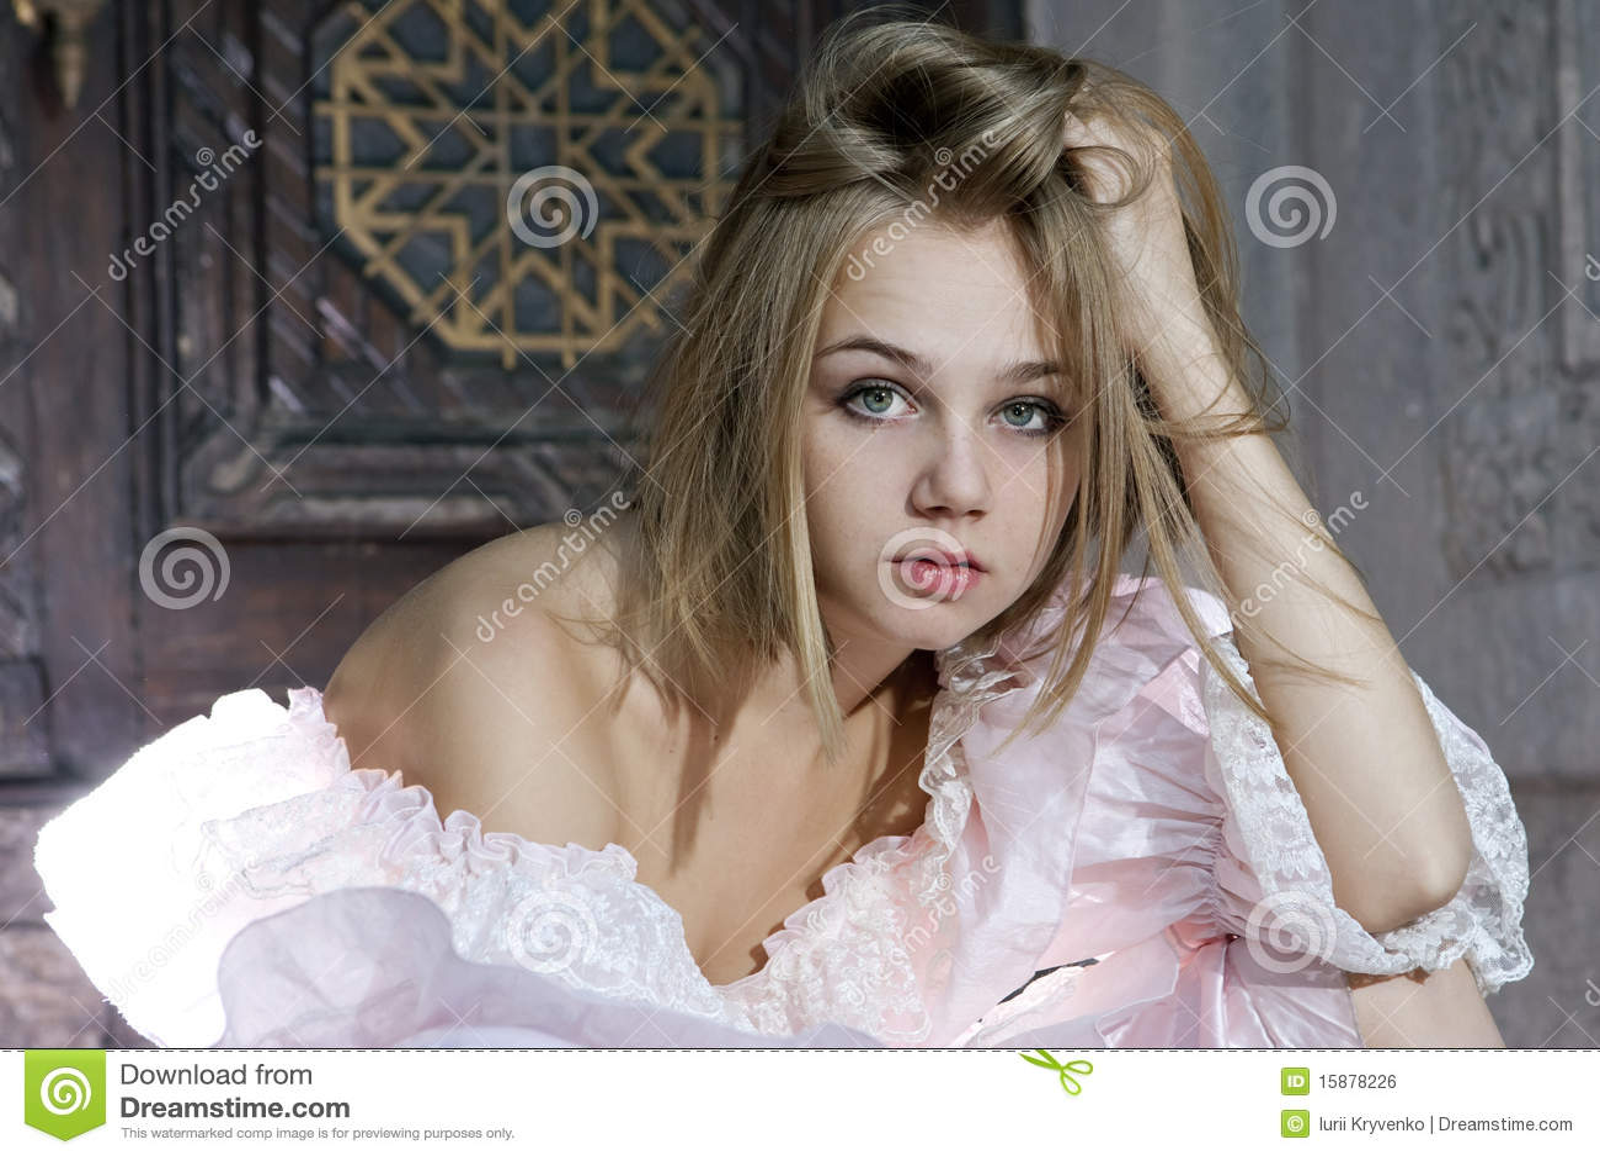 Nude teen girl medieval xxx movies